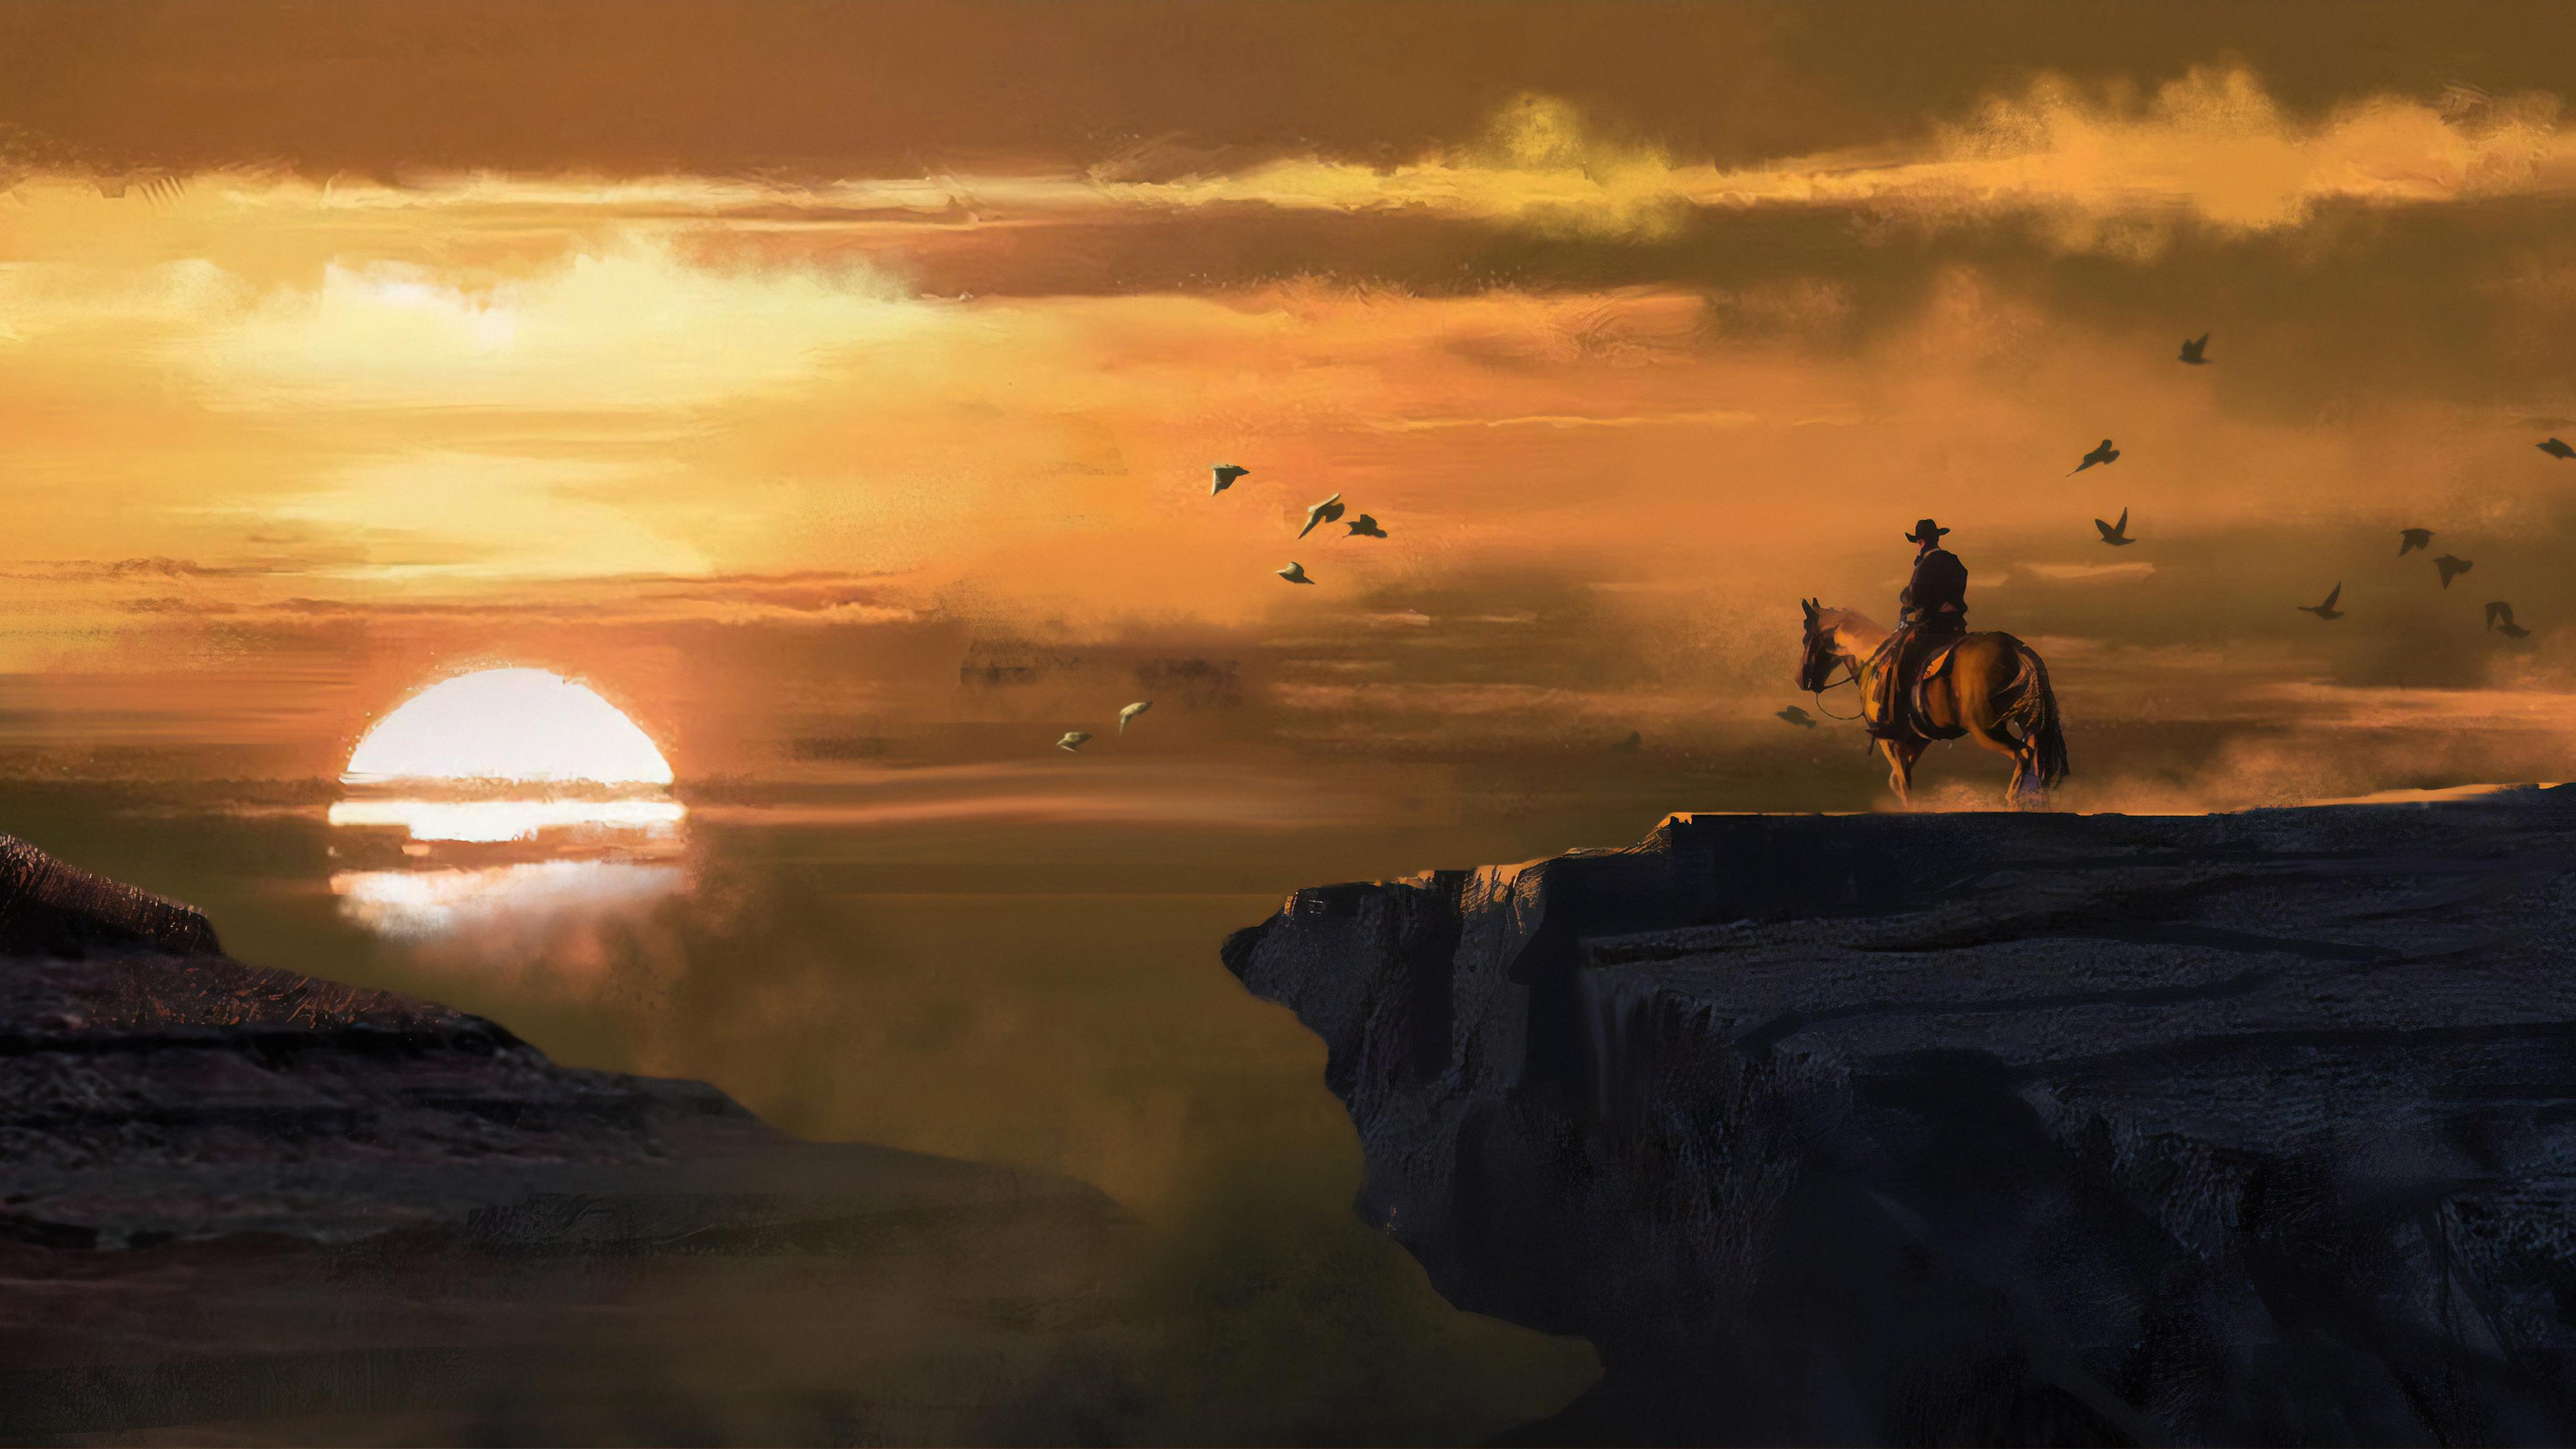 4k Landscape From Red Dead Redemption Wallpaper Hd Nature 4k